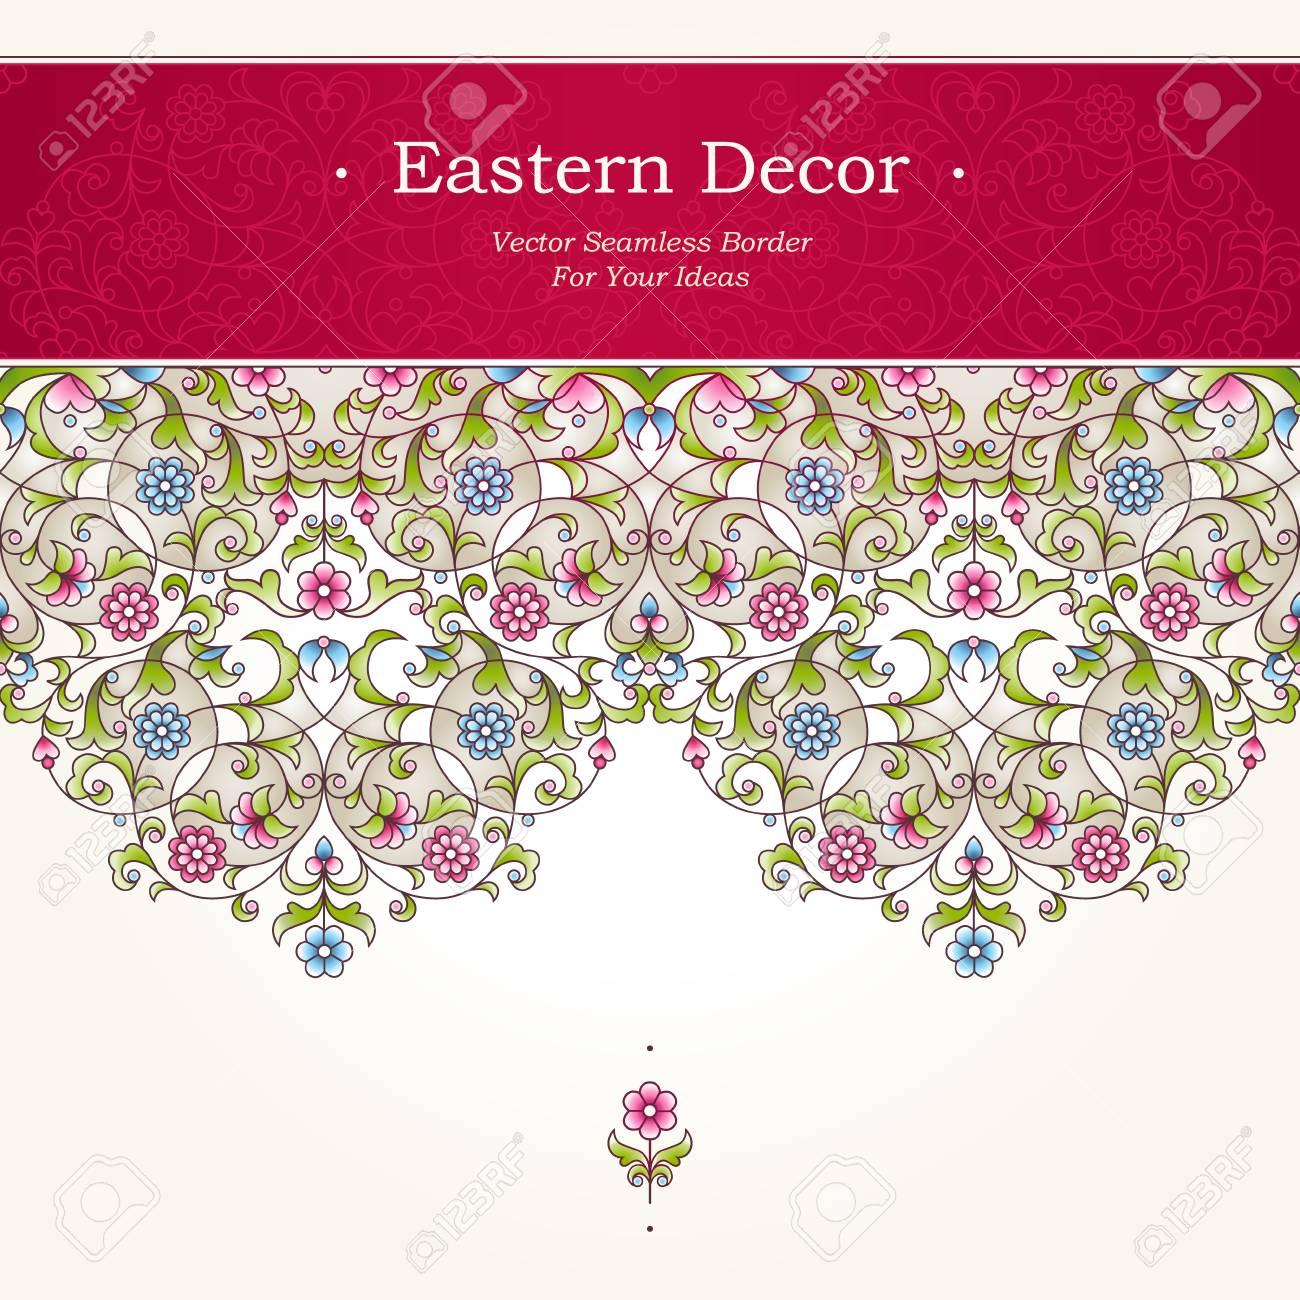 Vector Seamless Border In Eastern Style. Ornate Element For Design ...